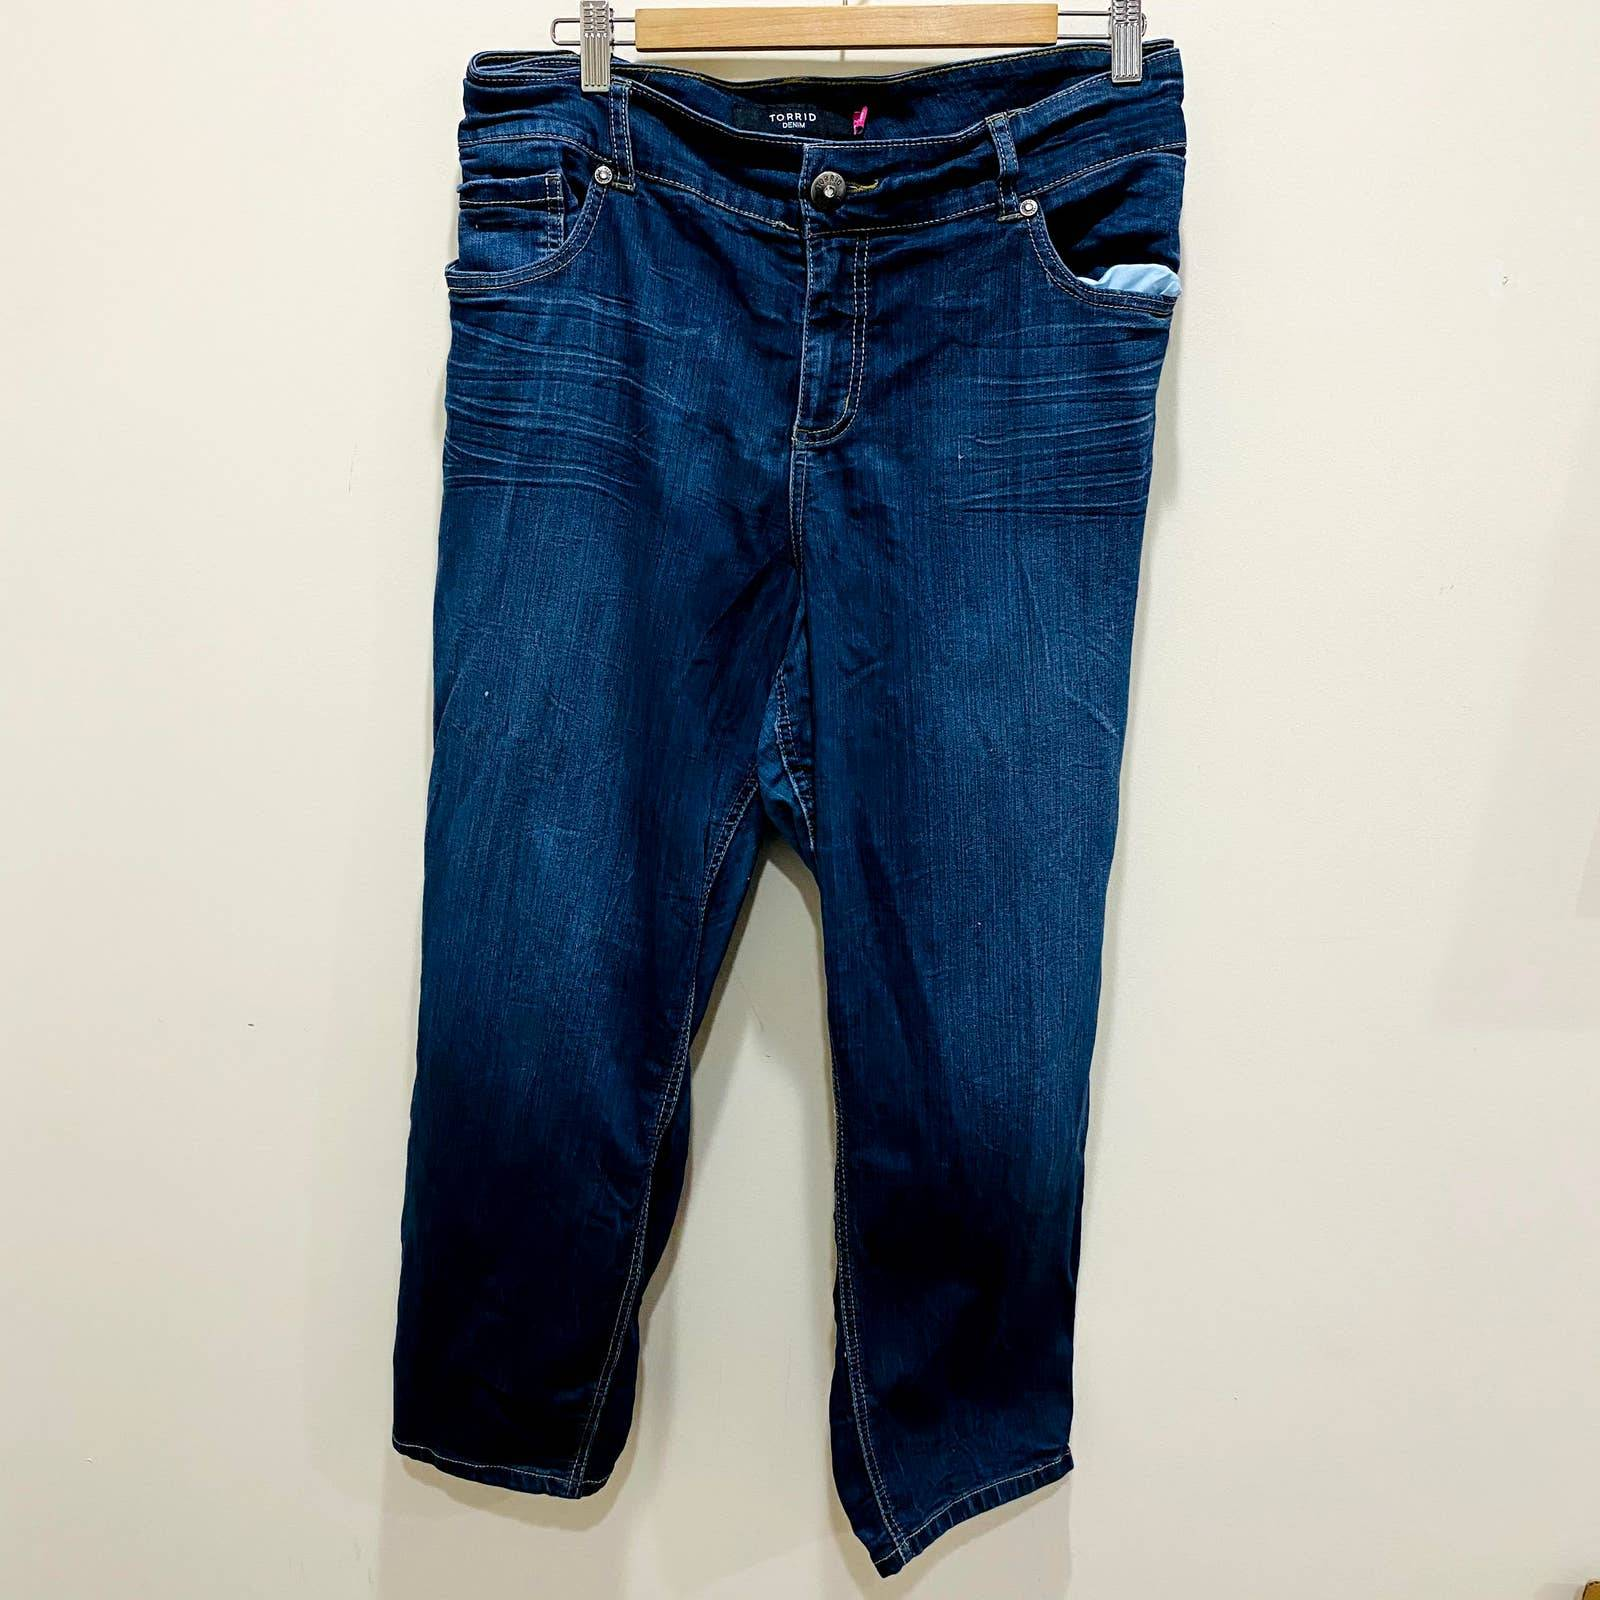 Torrid Medium Wash Skinny Jeans Size 26